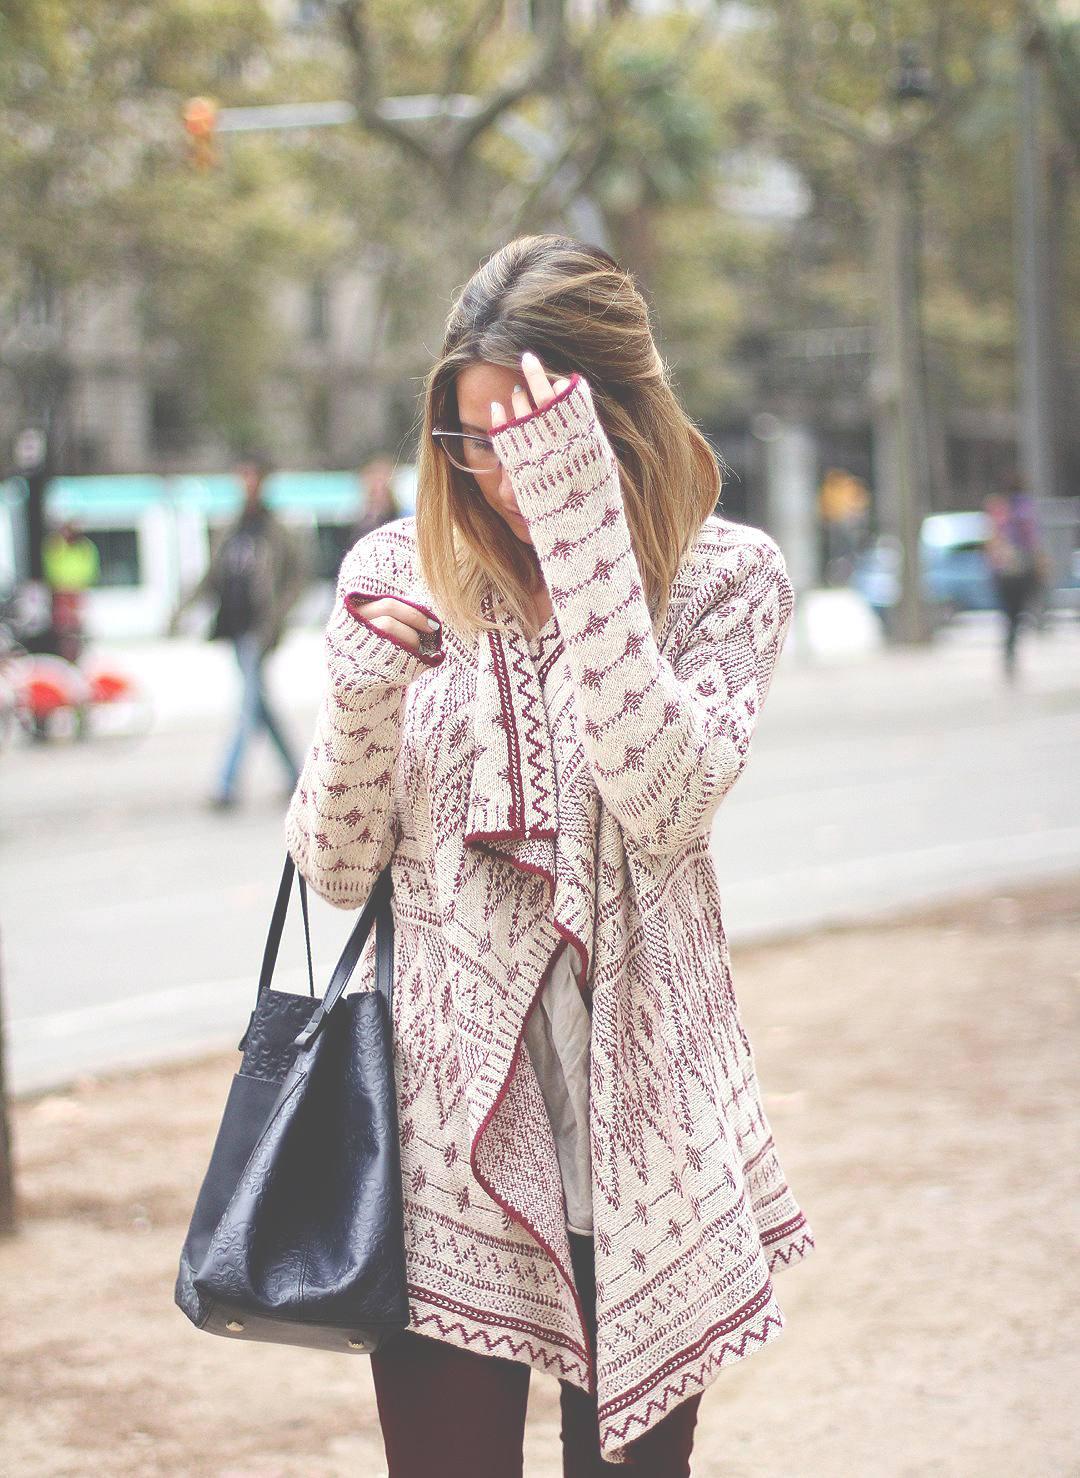 Suiteblanco-blogger-autumn-outfit-2015-92 copia